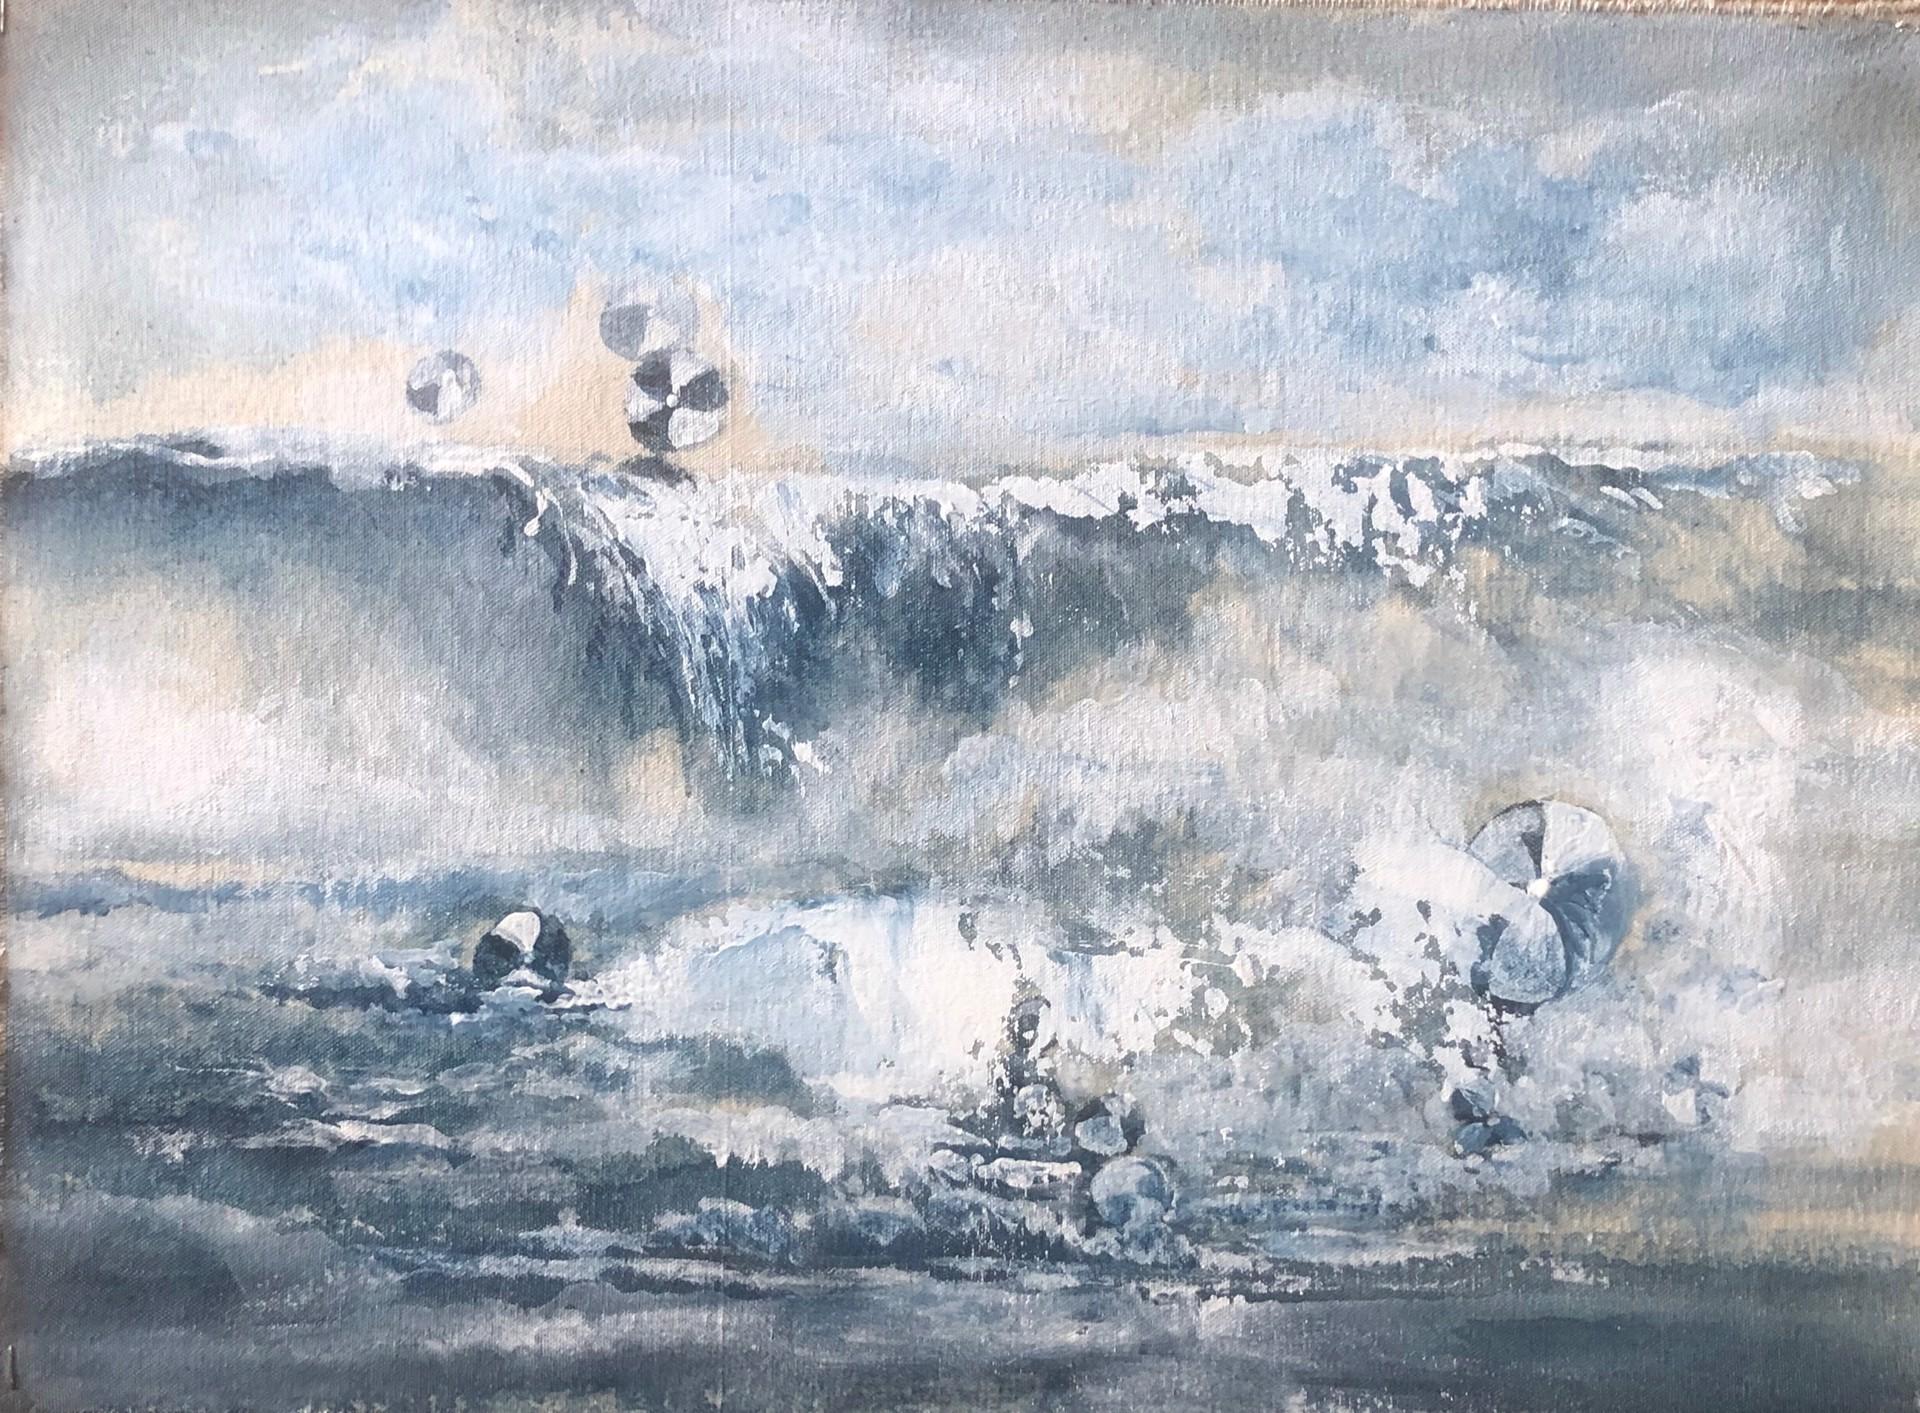 Splashdown by Andrei Petrov